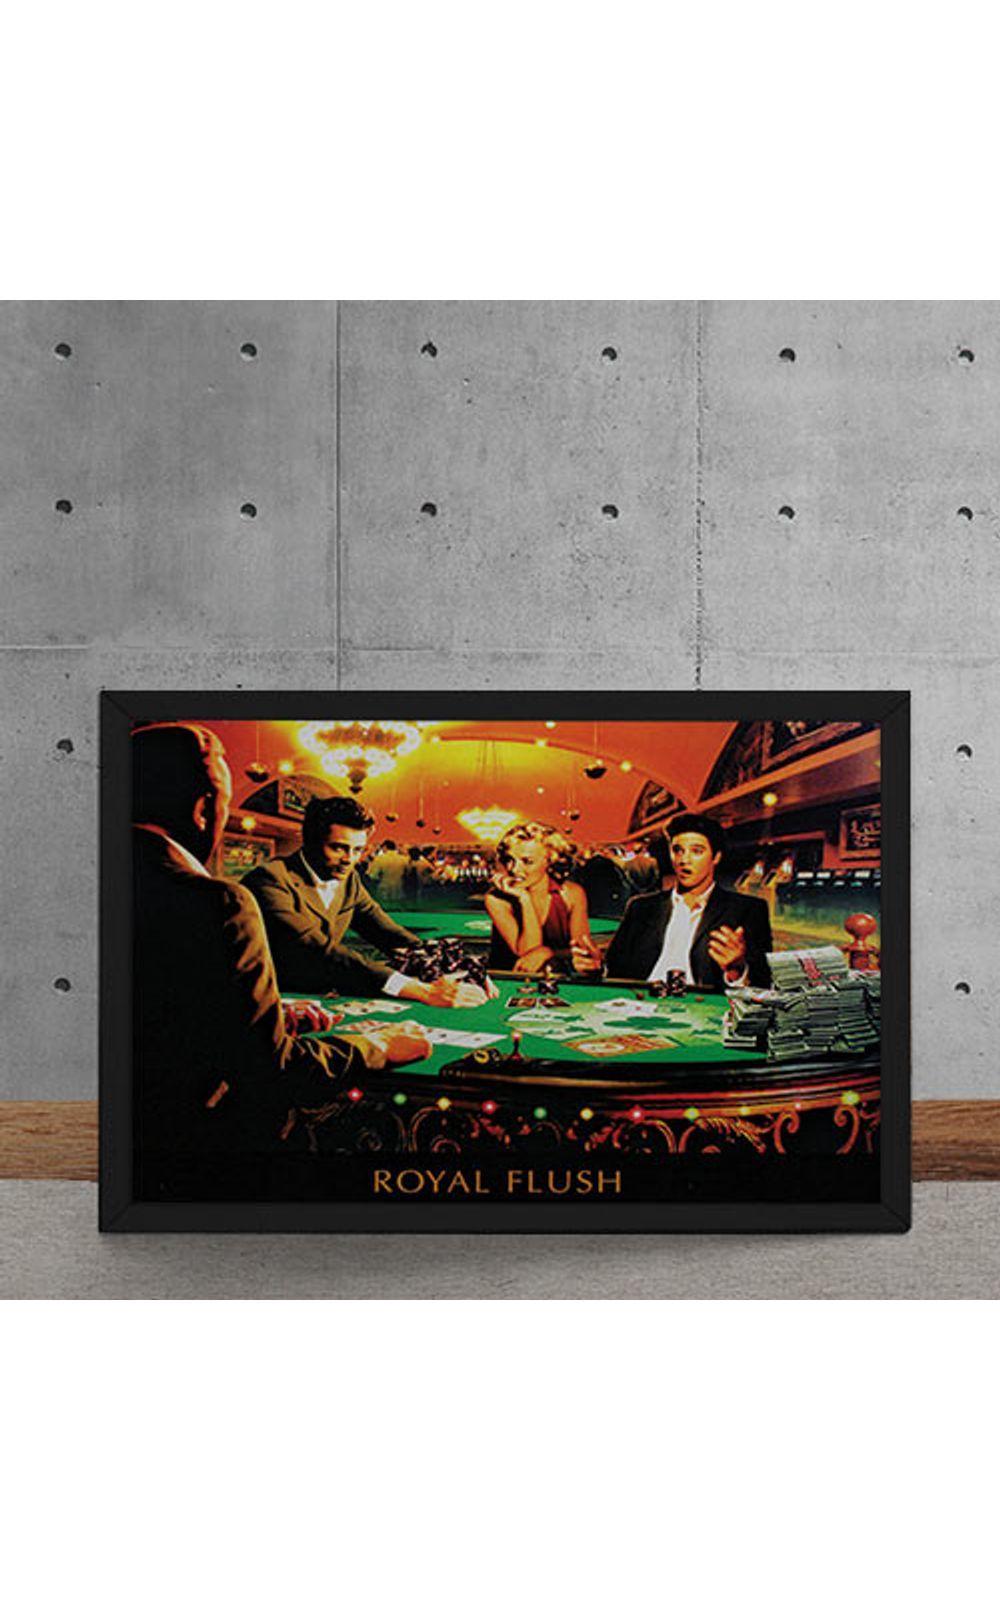 Foto 5 - Quadro Decorativo Poker Royal Flush Marylin Monroe Elvis Presley James Dean Humphrey Bogart